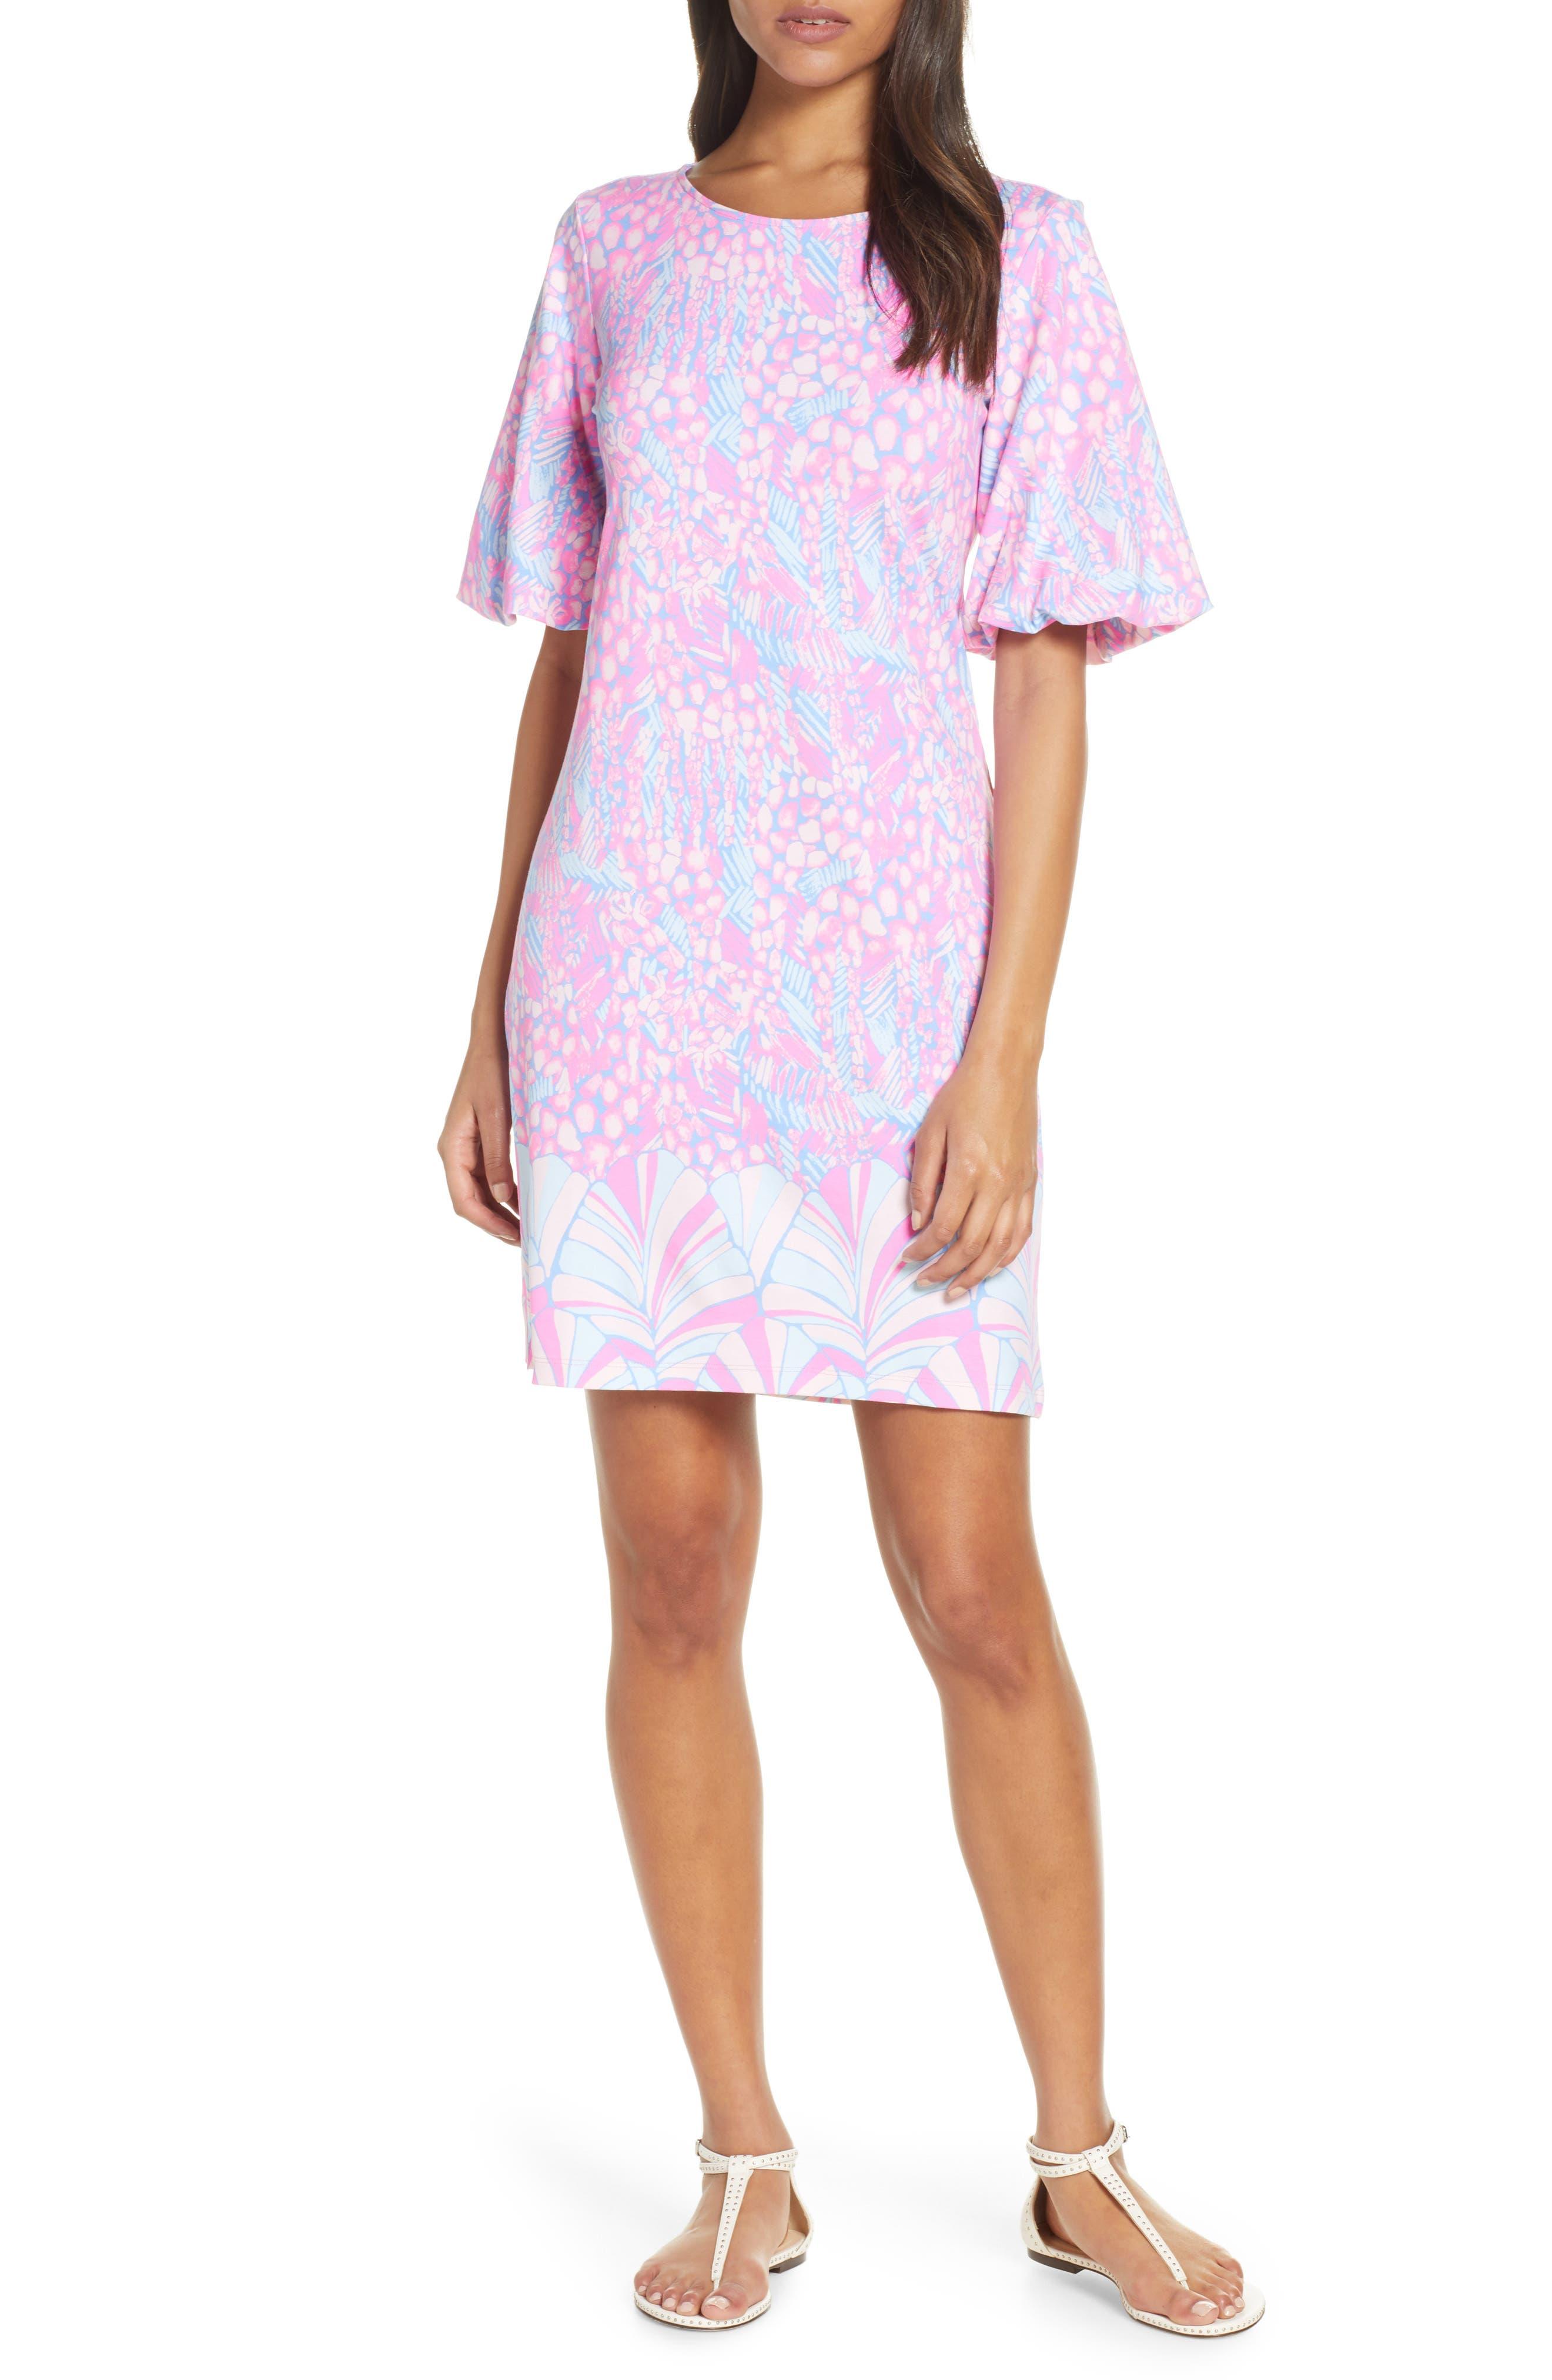 Lilly Pulitzer Britton Shift Dress, Pink